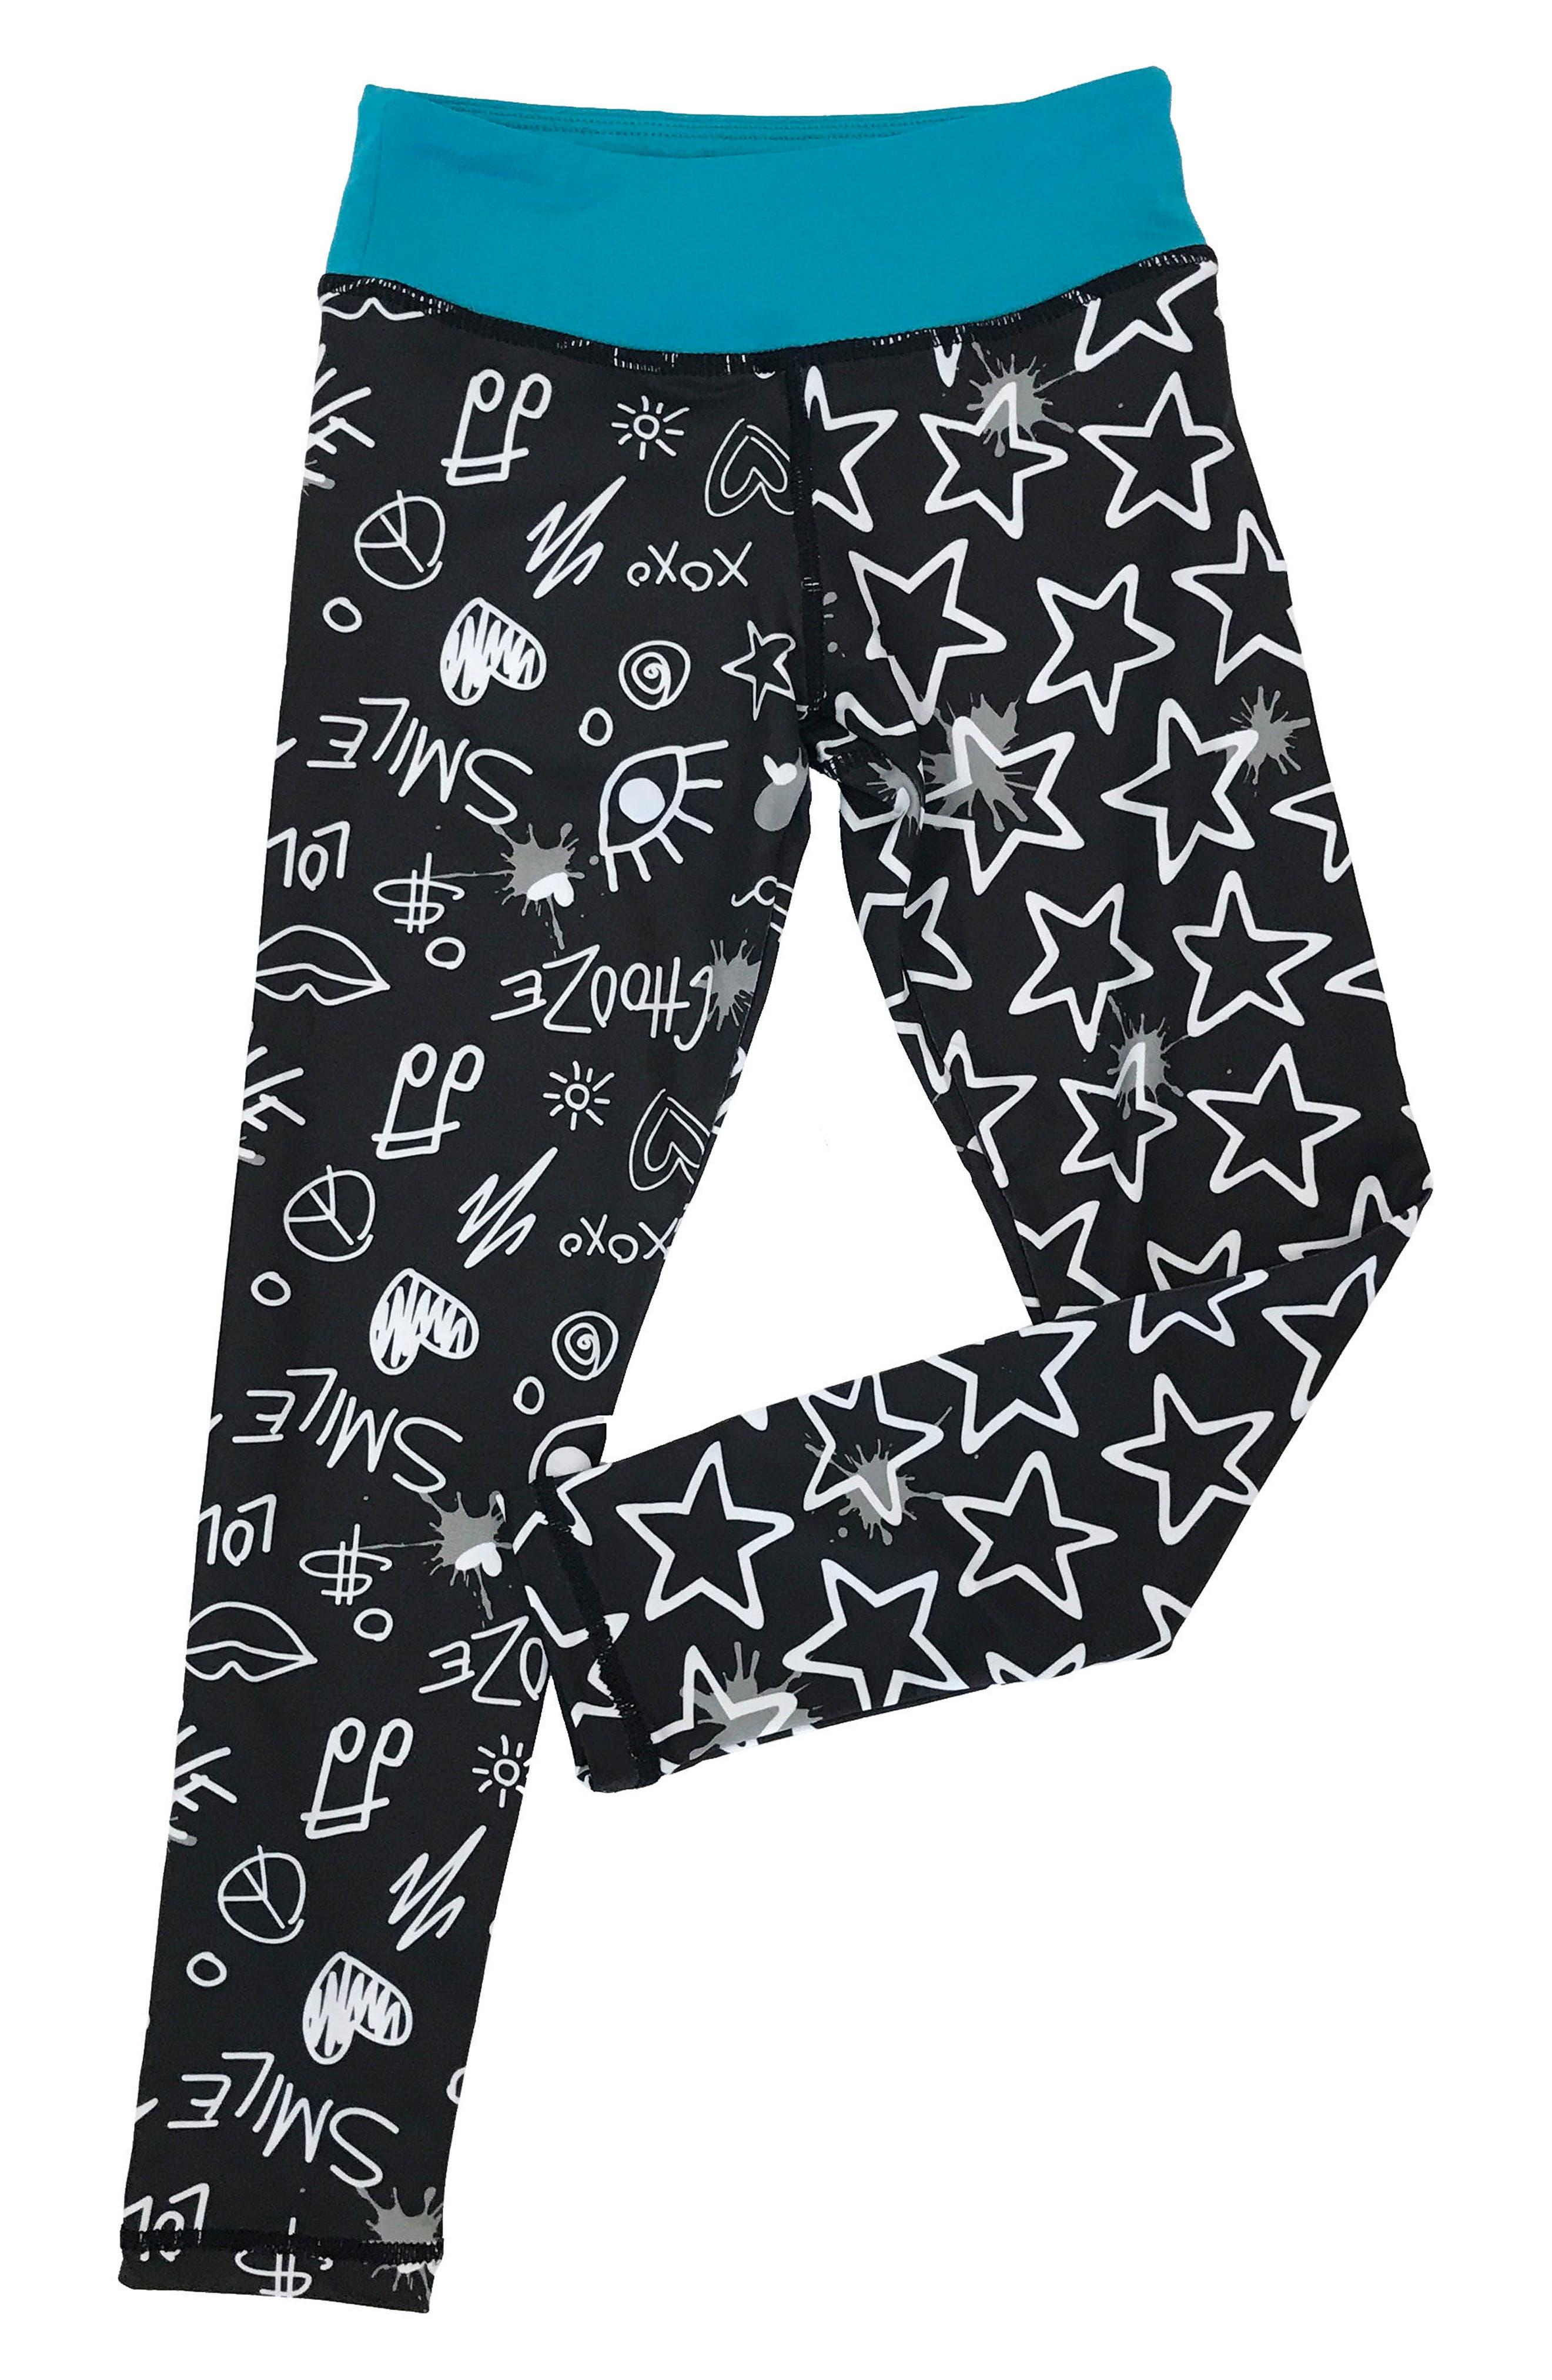 'Splits' Mixed Print Leggings,                             Main thumbnail 1, color,                             Draw Black